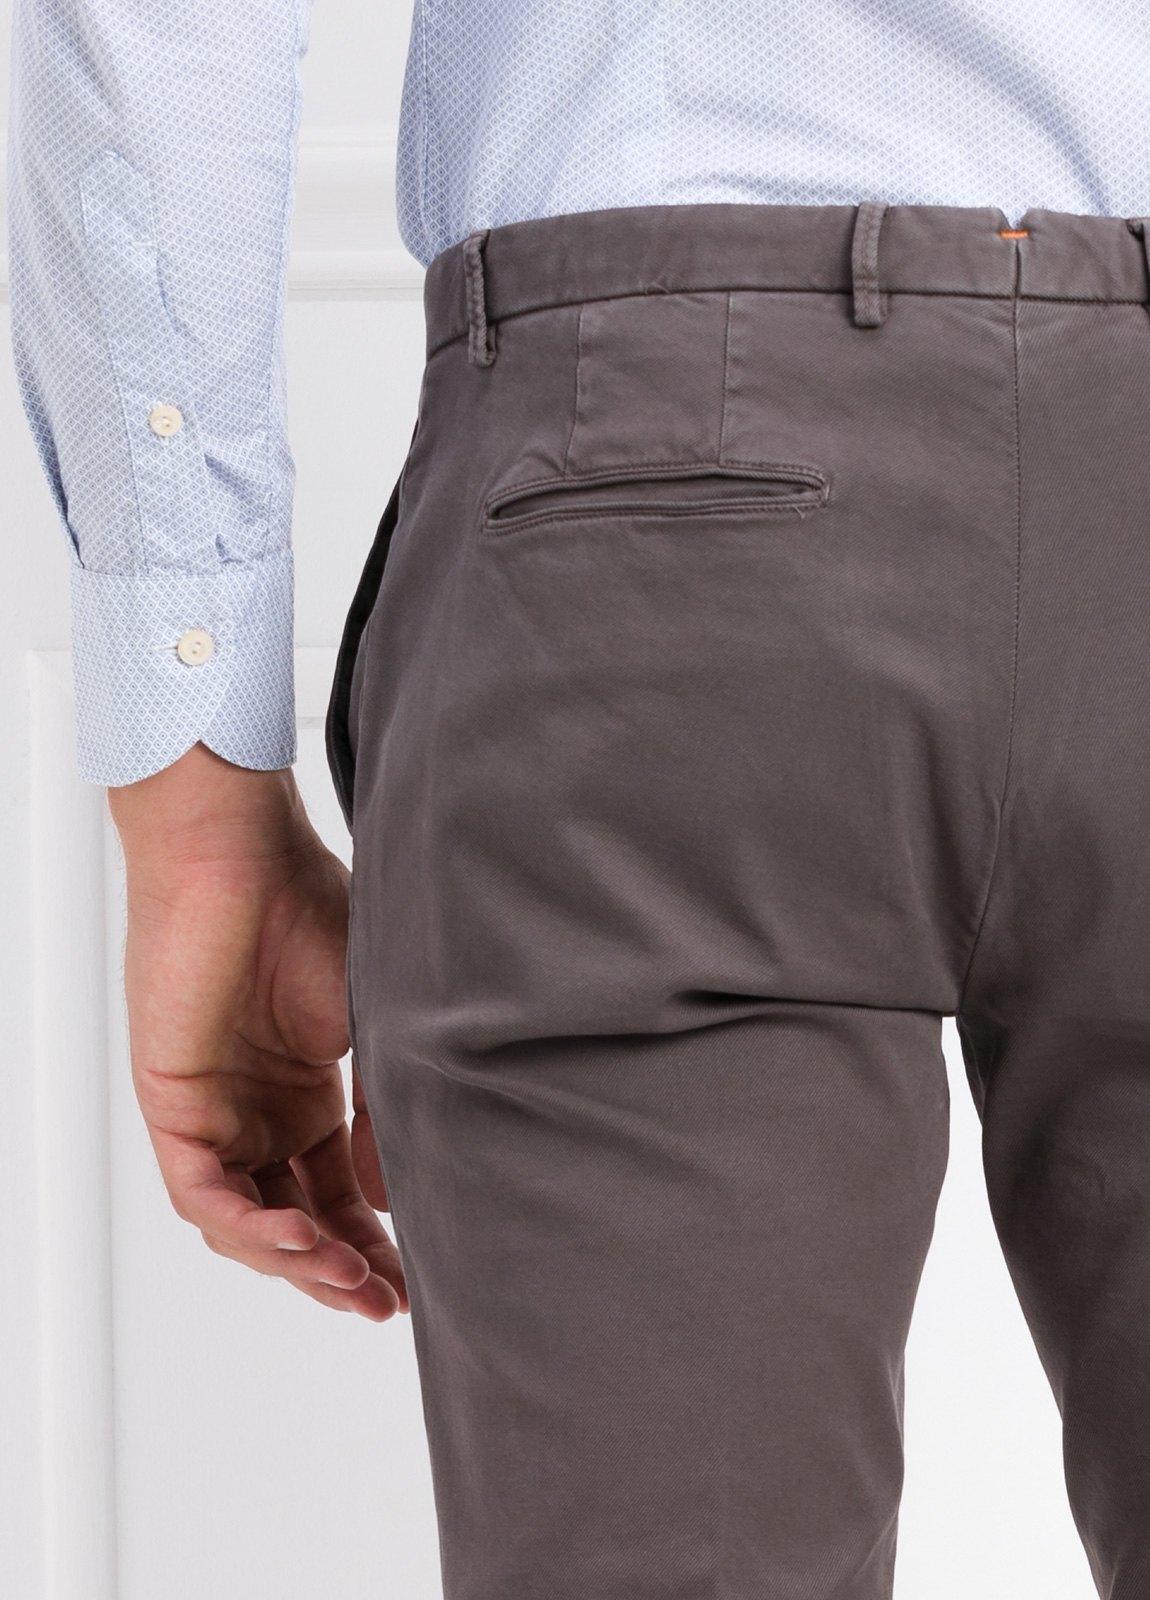 Pantalón modelo slim fit color gris. 97% Algodón 3% Ea. - Ítem2